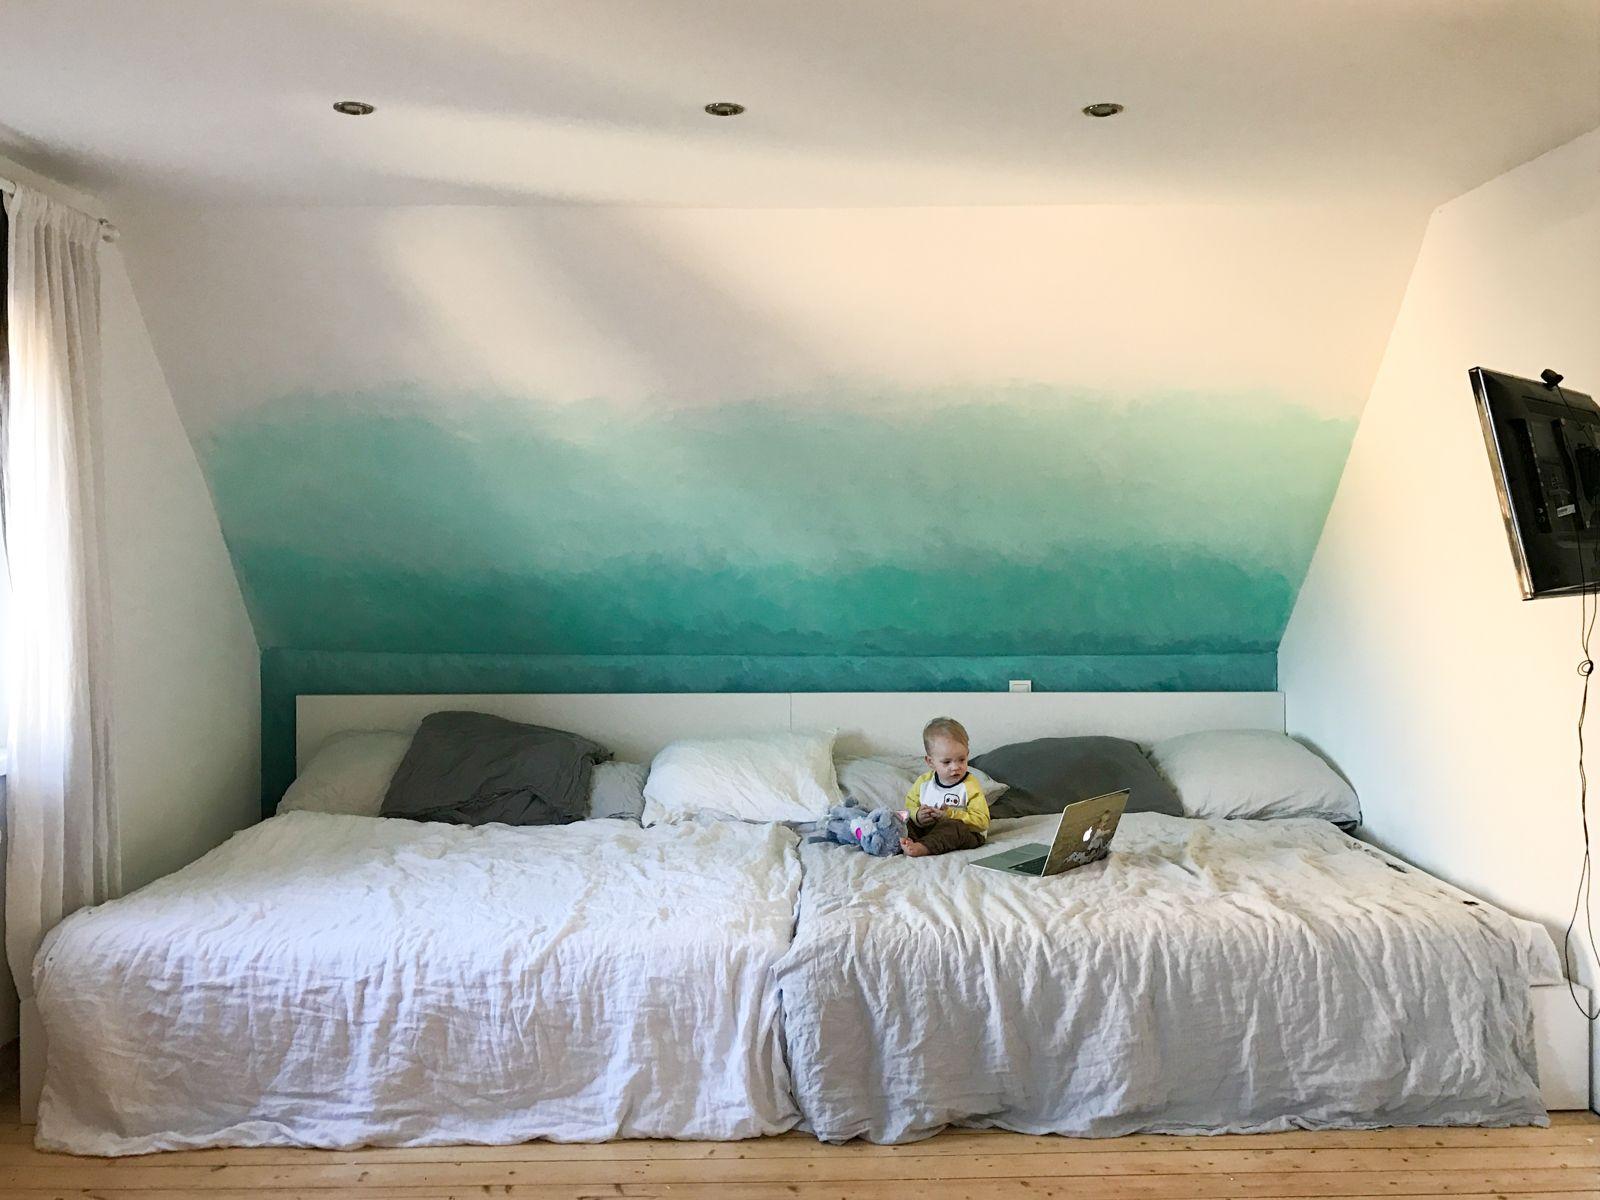 Full Size of Projekt Groes Familienbett Xxl Möbel Boss Betten Bett Schlicht 120x200 Weiß Buche Mit Aufbewahrung 90x200 Lattenrost Und Matratze 160x200 Günstiges Bett Großes Bett